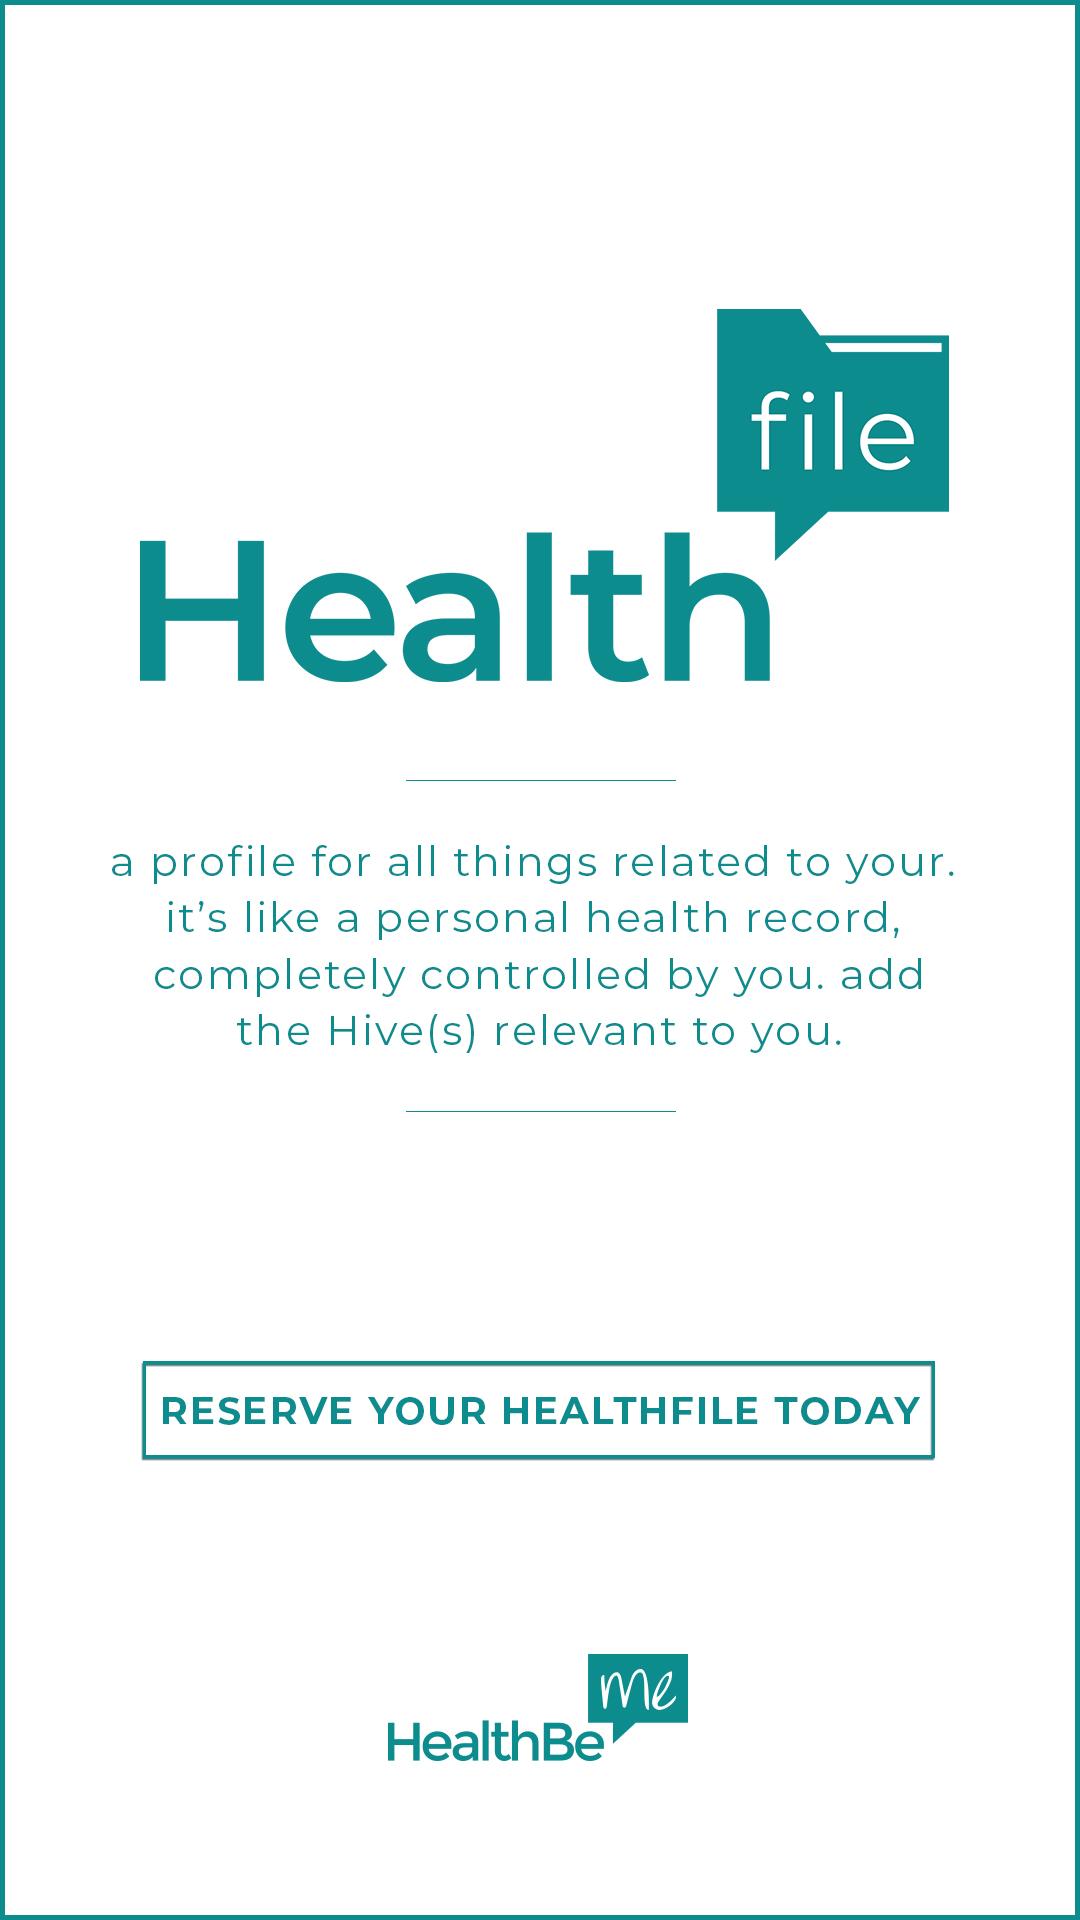 healthfile_story_exp.jpg